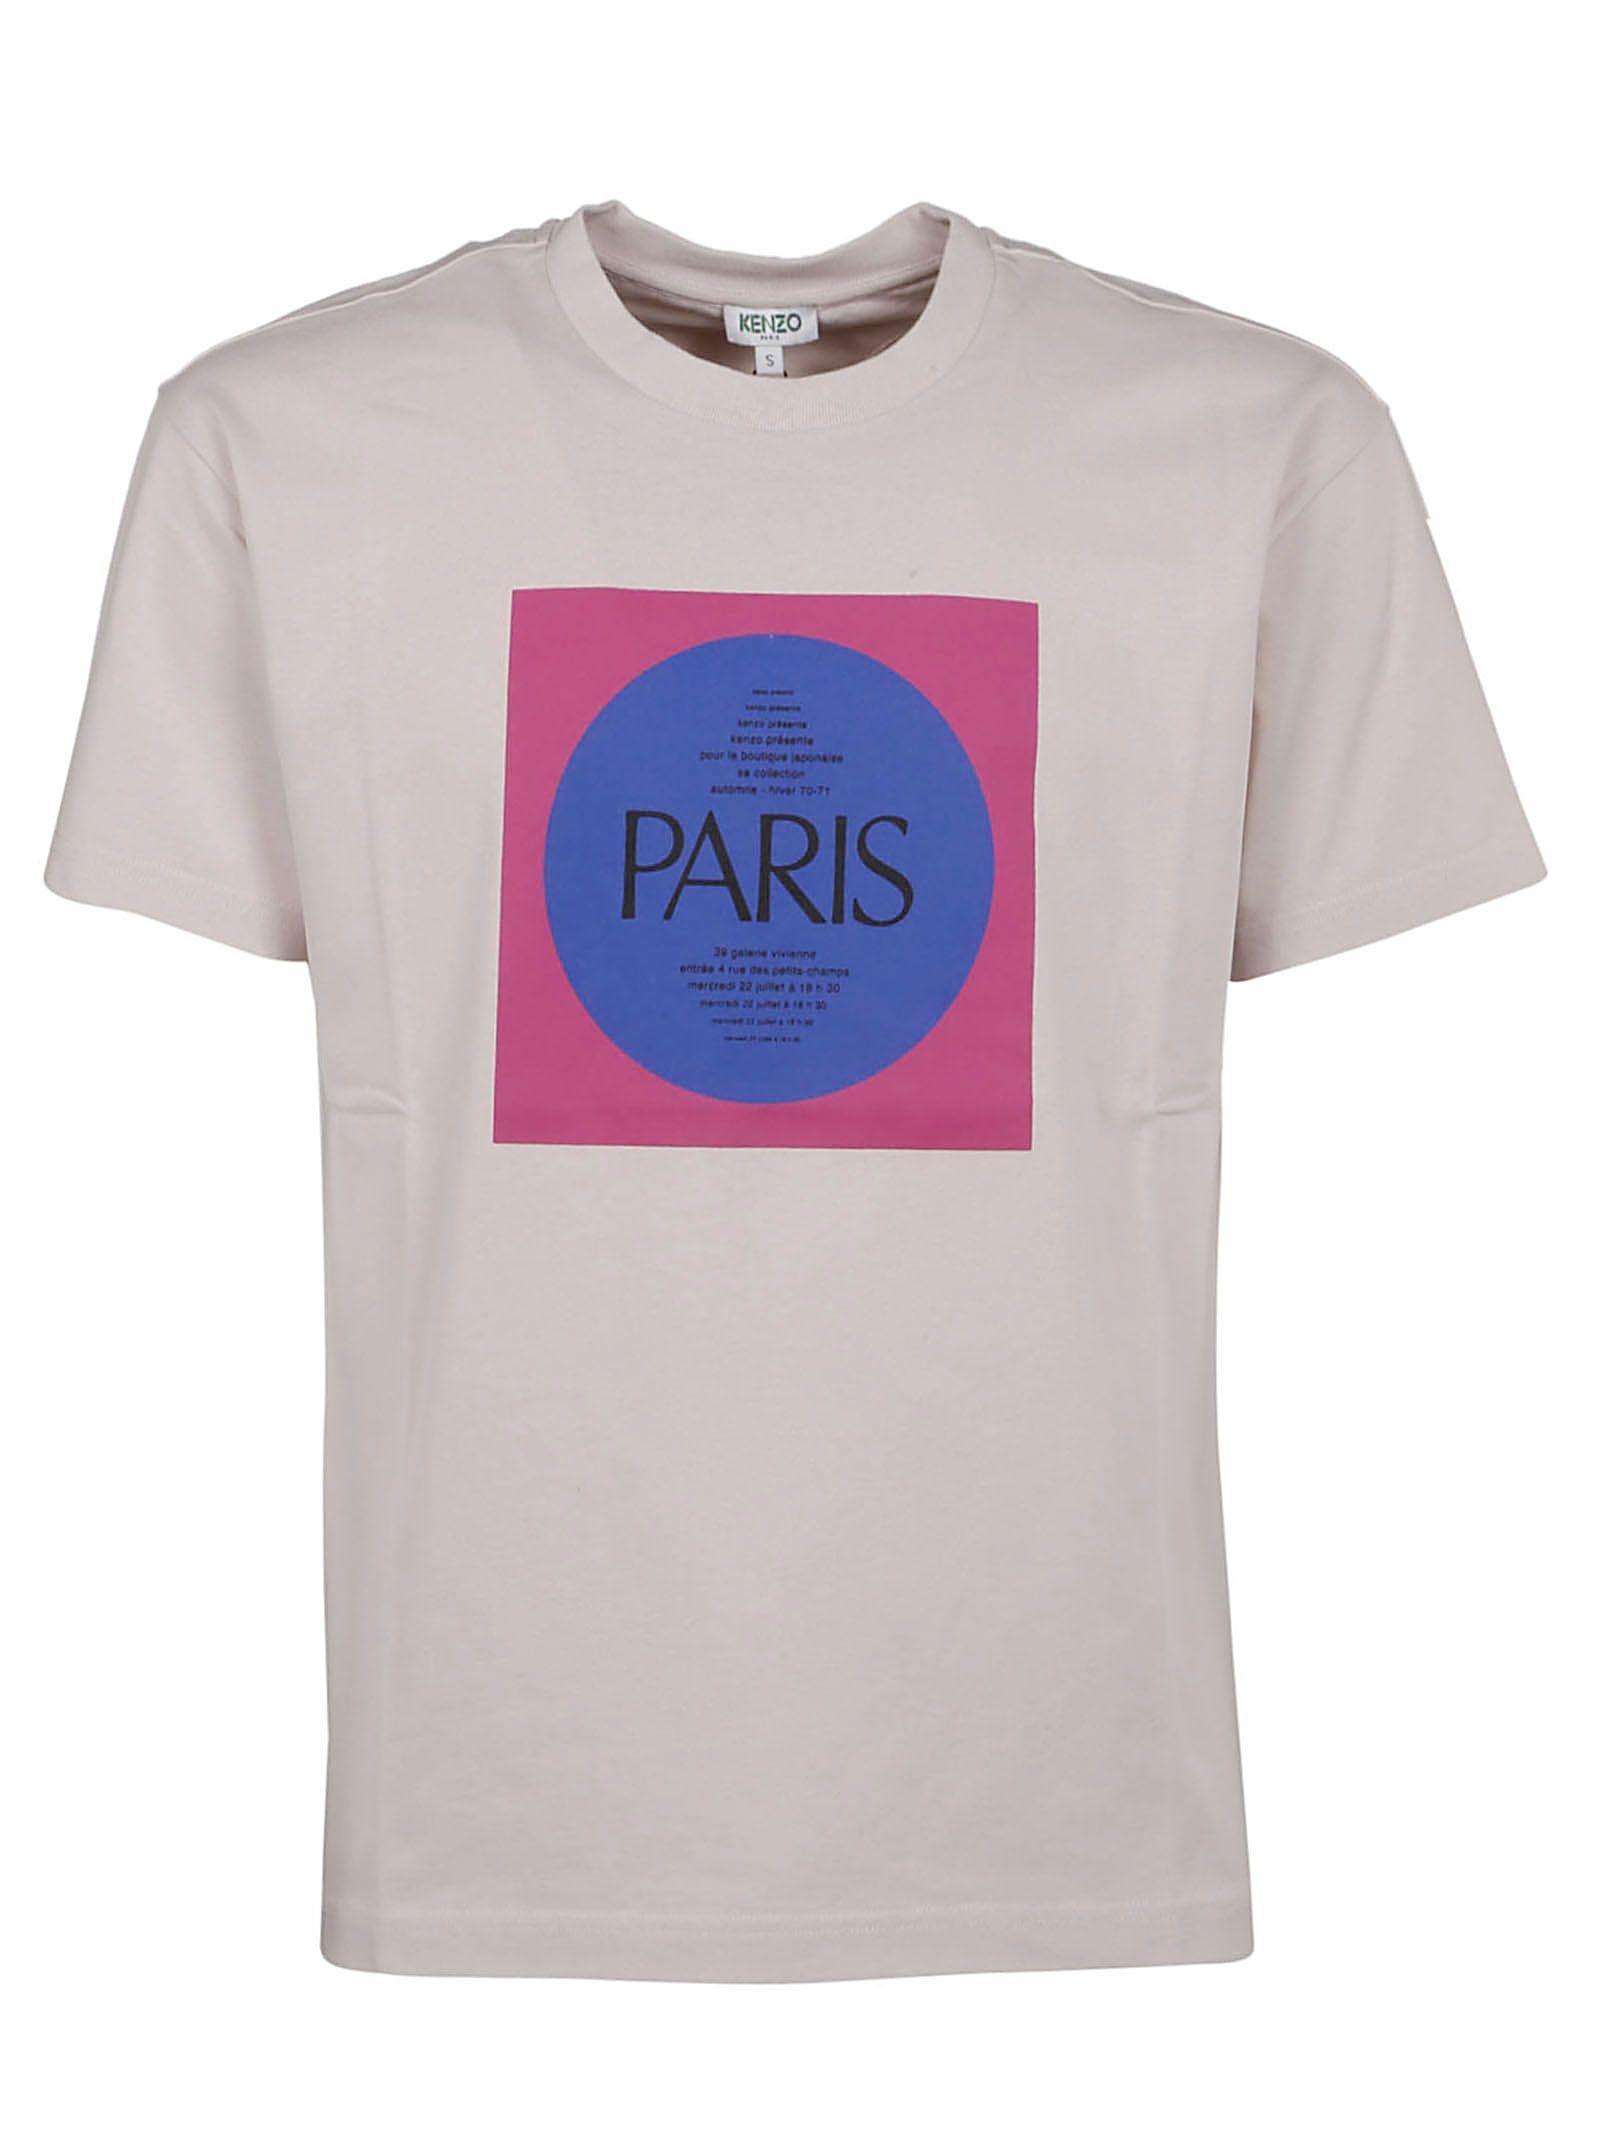 e69edf3591 KENZO PARIS T-SHIRT. #kenzo #cloth | Kenzo in 2019 | Paris t shirt ...